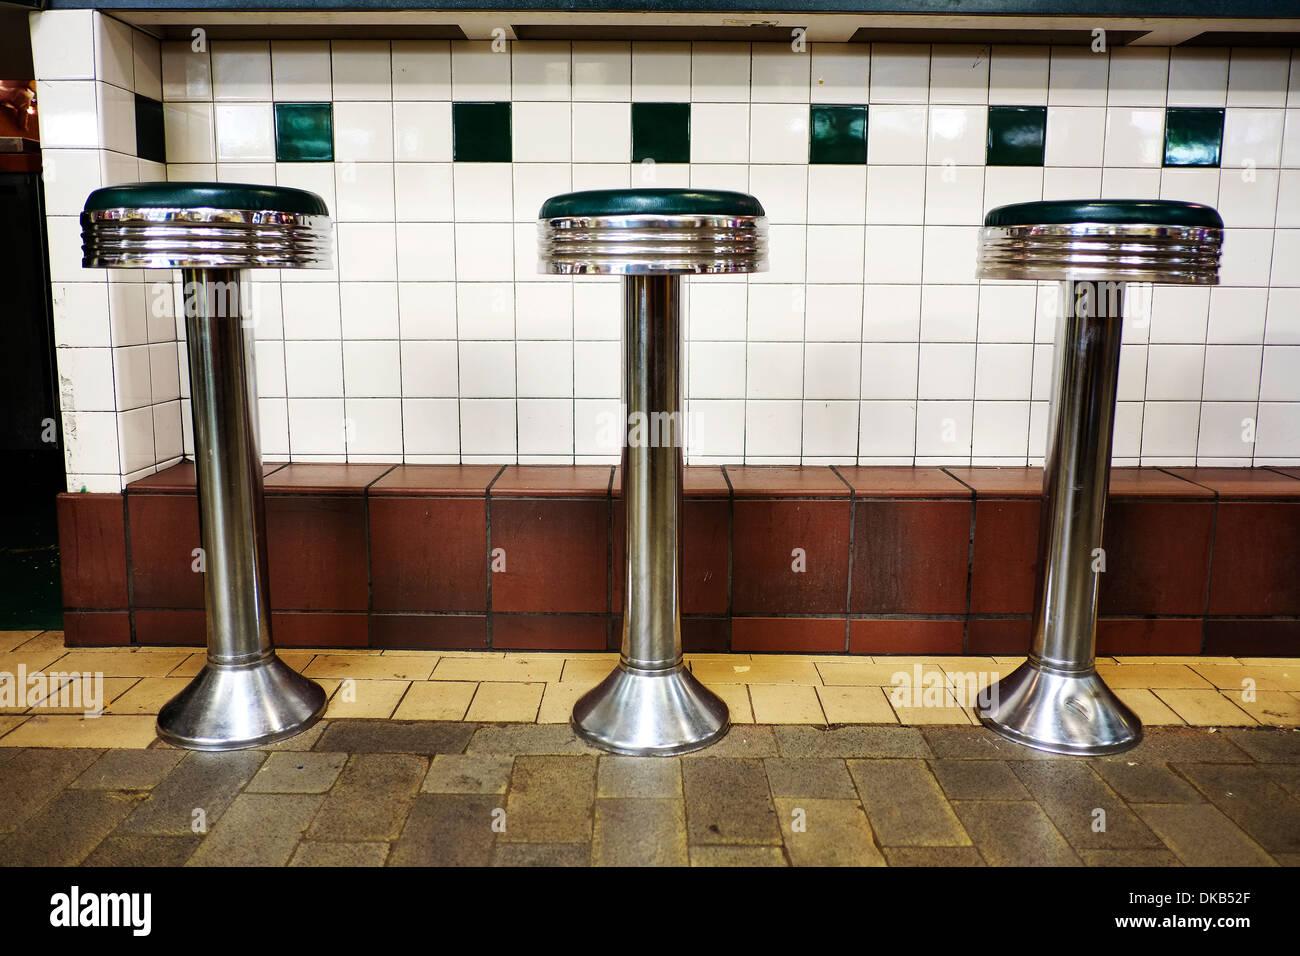 Sgabelli Bar Americani : Bar stools at diner immagini bar stools at diner fotos stock alamy